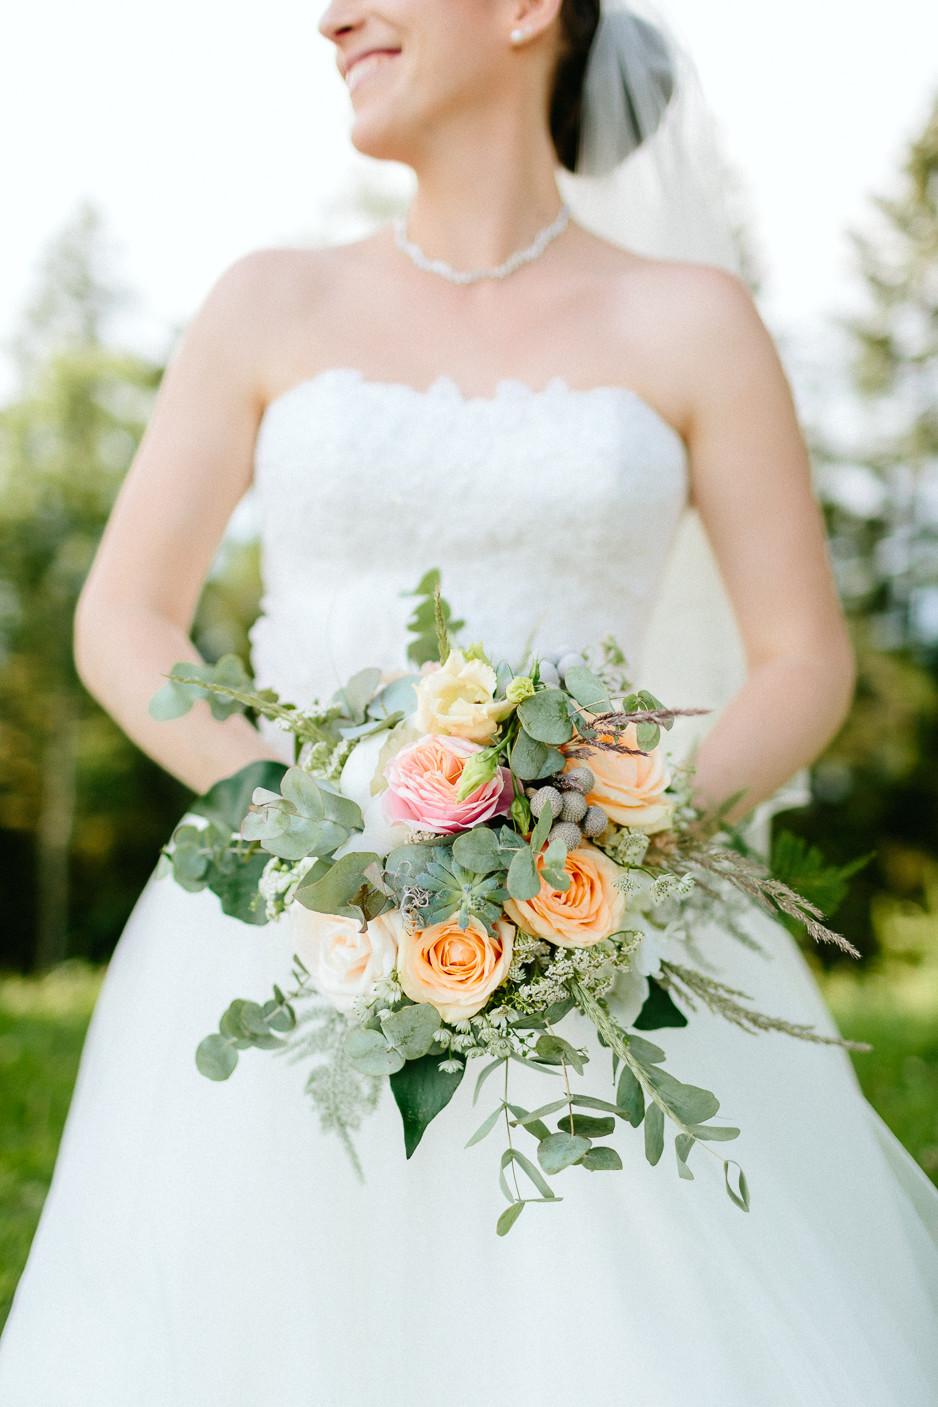 Silvia+Philipp - SP-Hochzeit-Magdalensberg-071.jpg